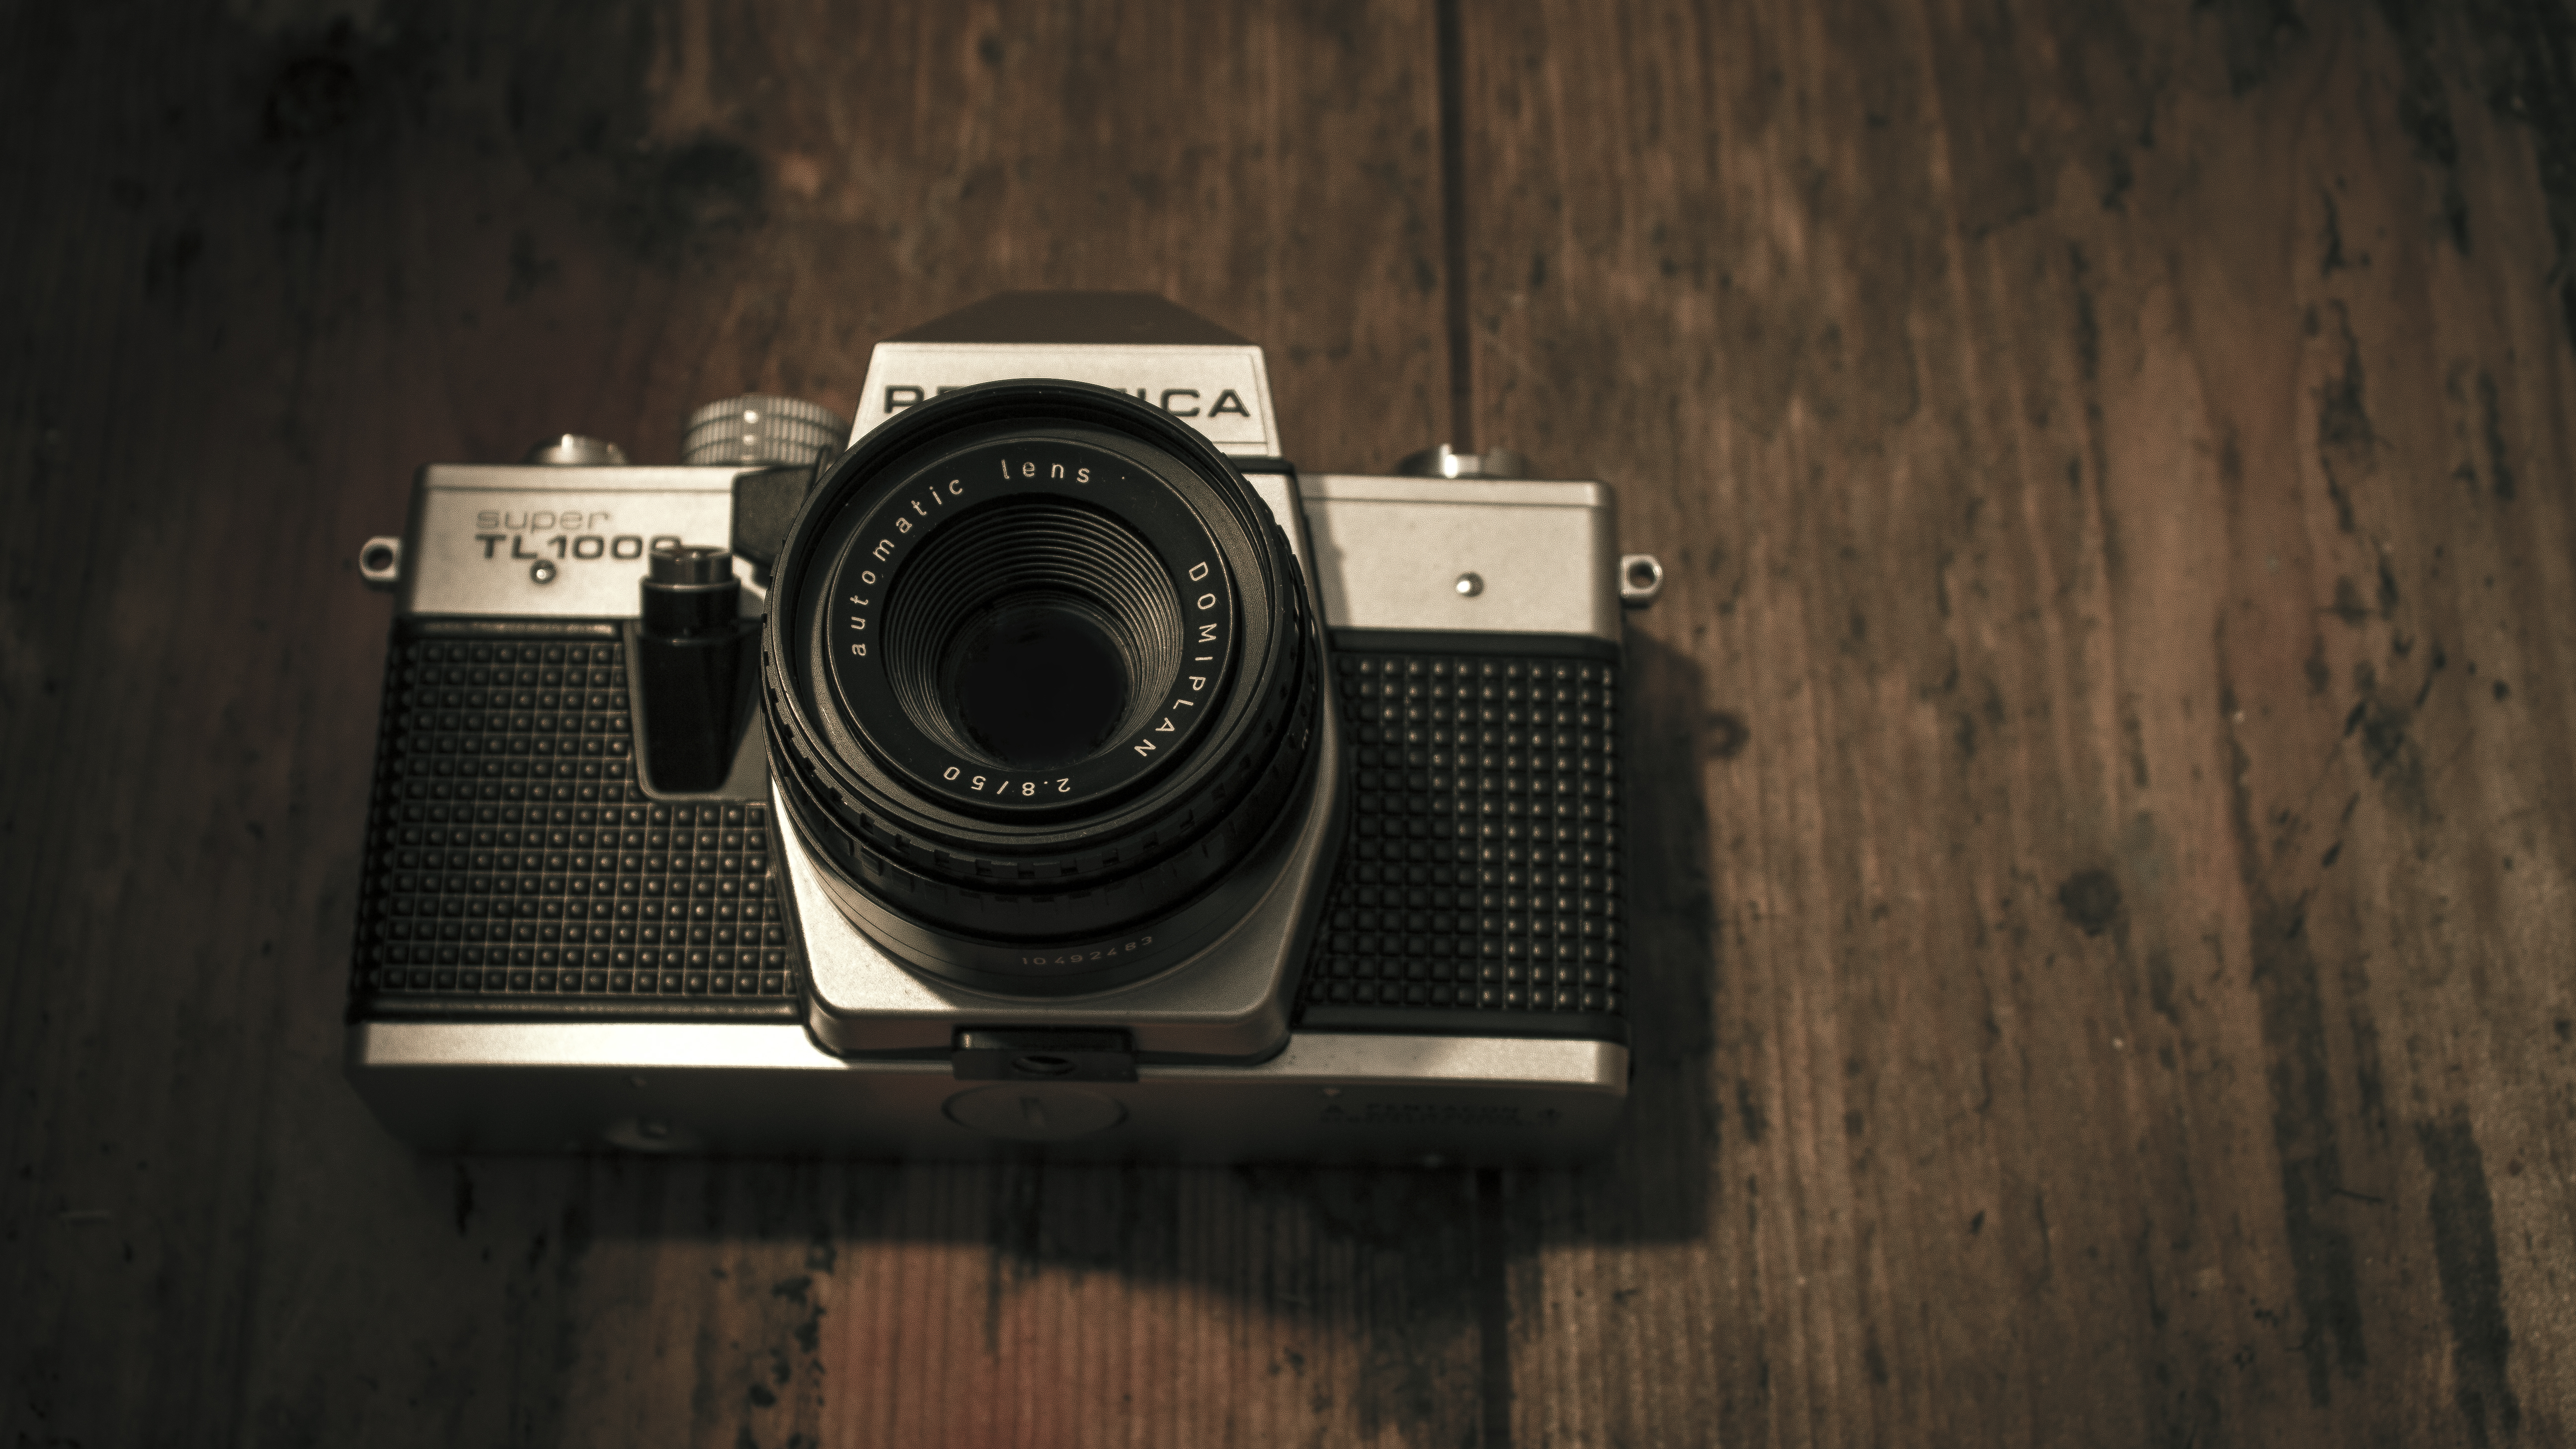 Camera Vintage Tumblr : Vintage polaroid camera clipart: stock photo of camera k search